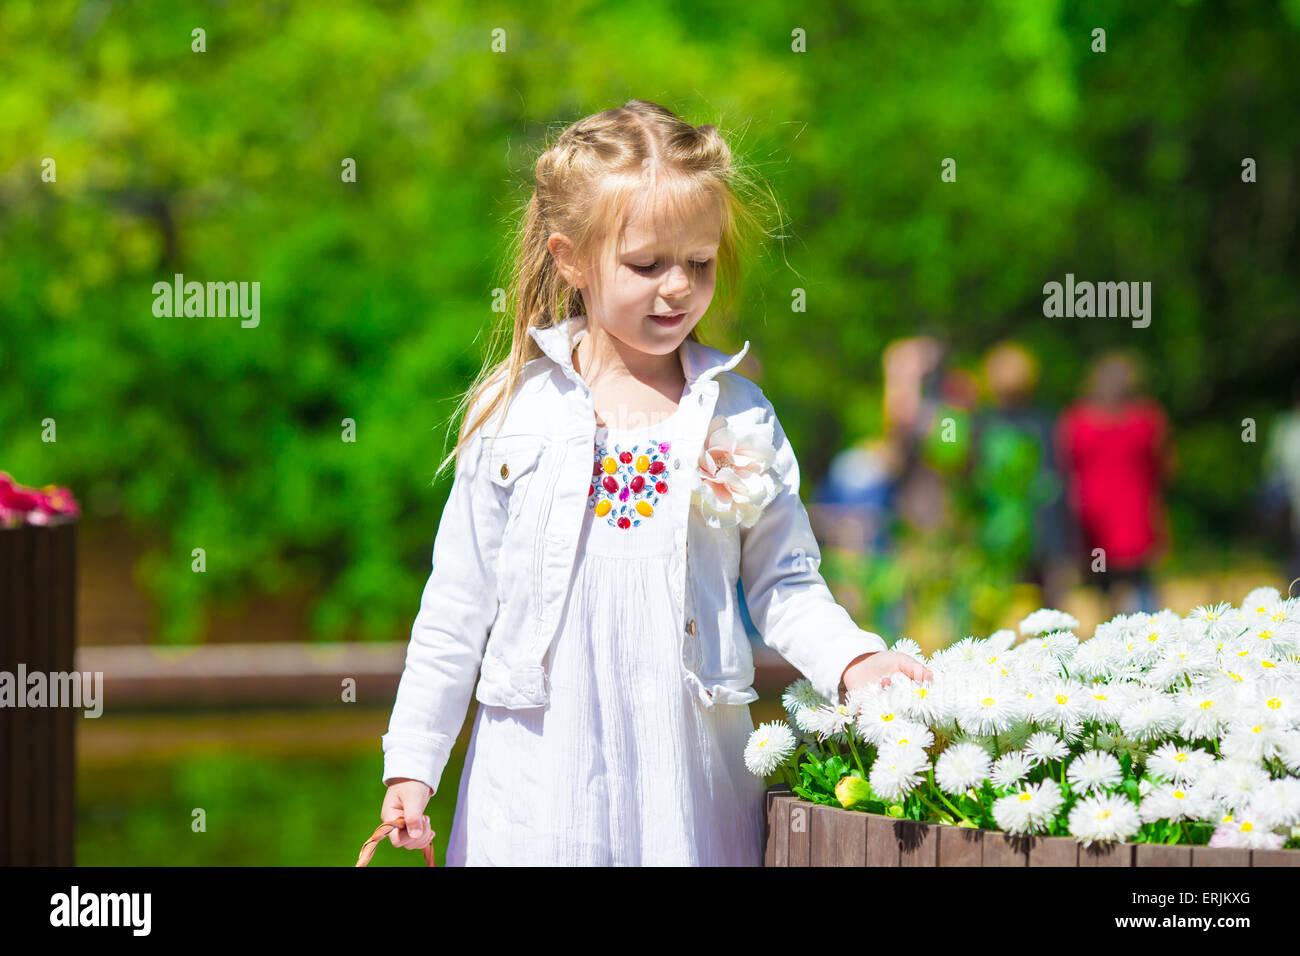 Spring garden, spring flowers, dorable little girl and tulips - Stock Image